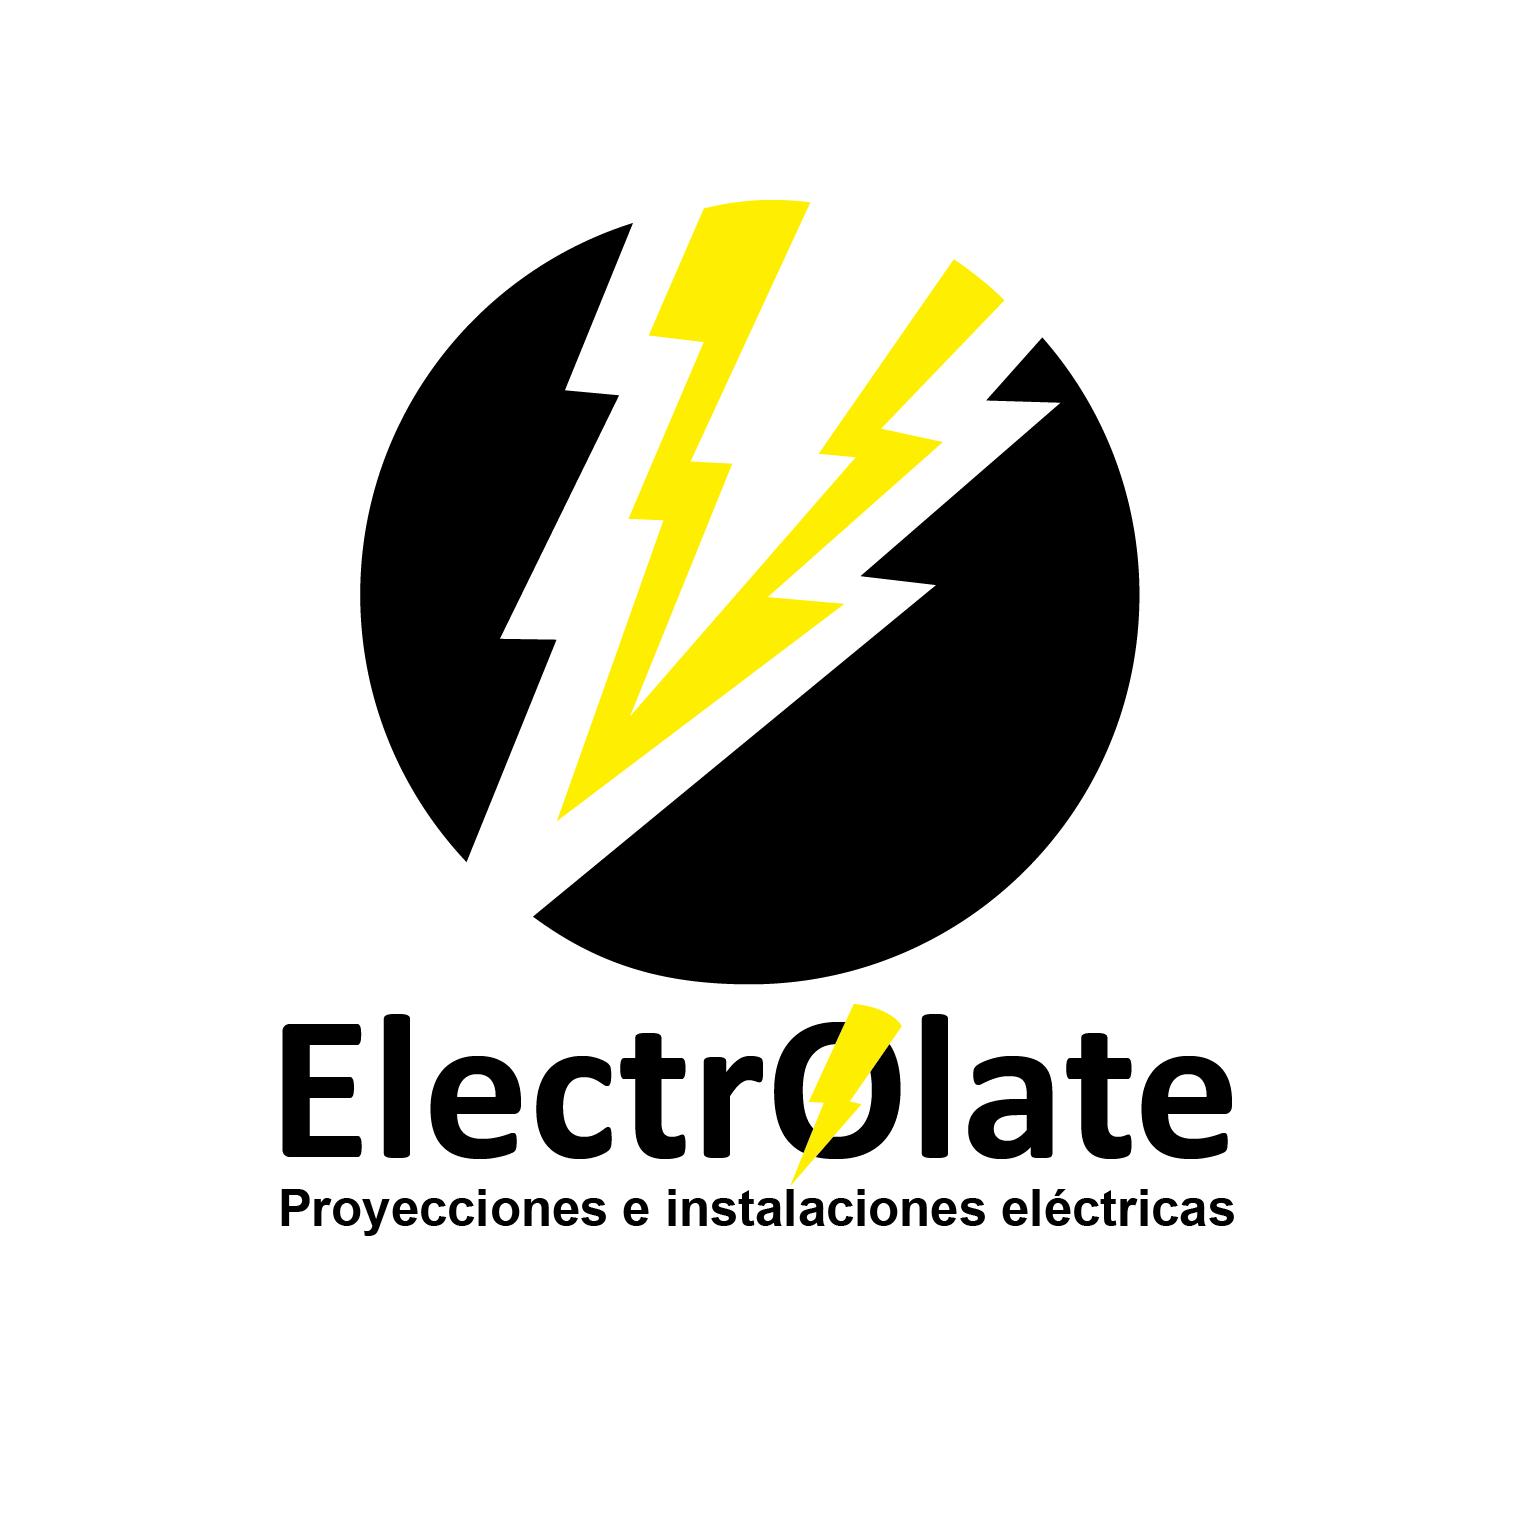 Electrolate